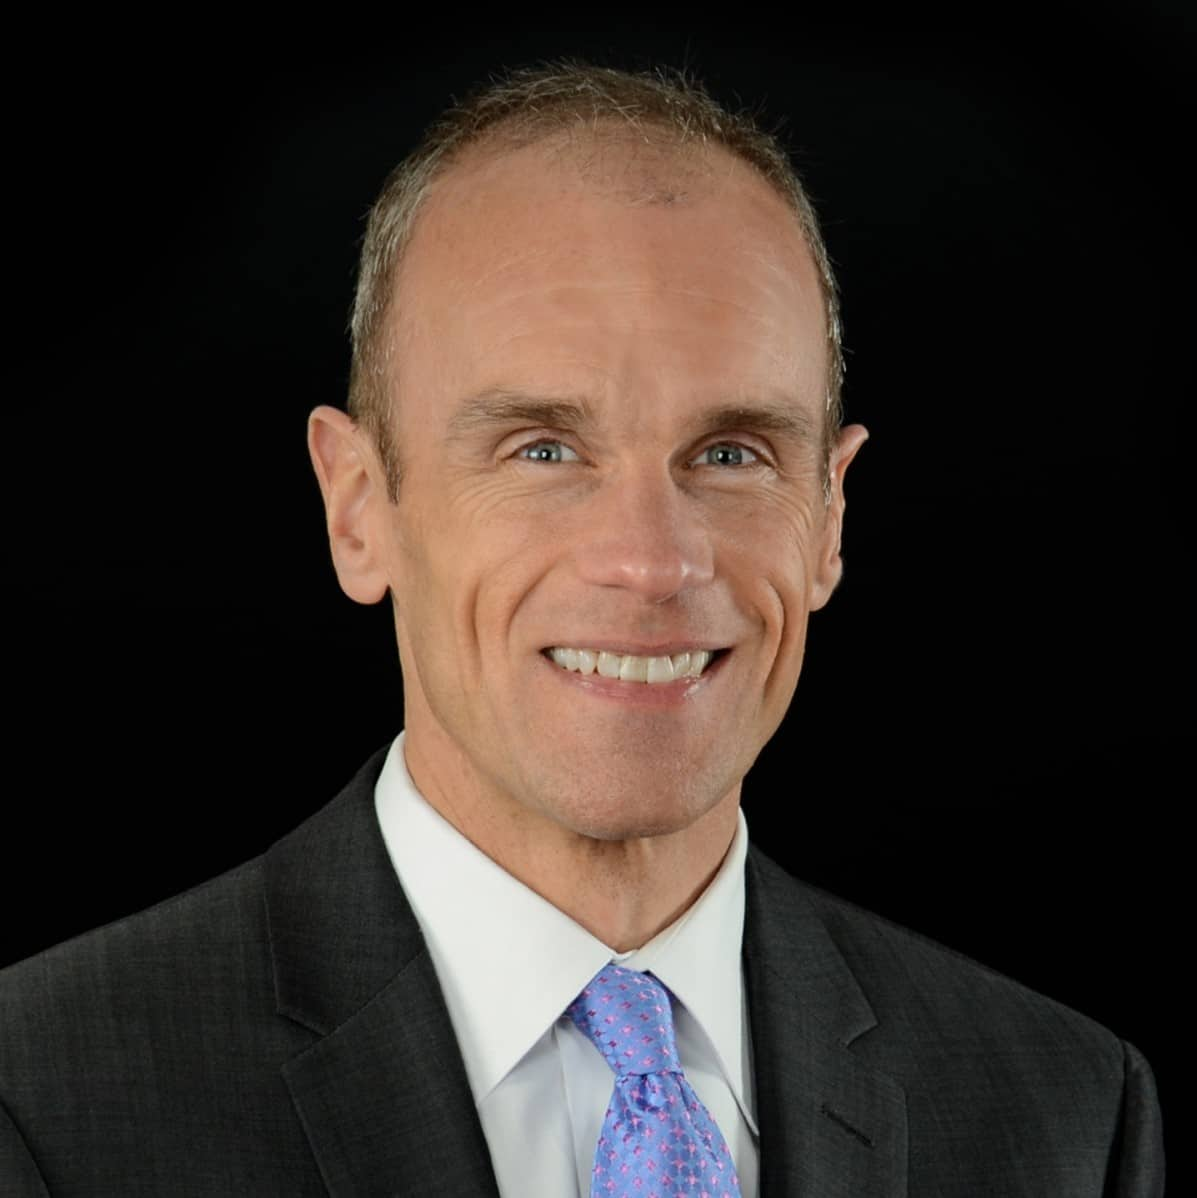 CTLN Opinion+: Doug Casey